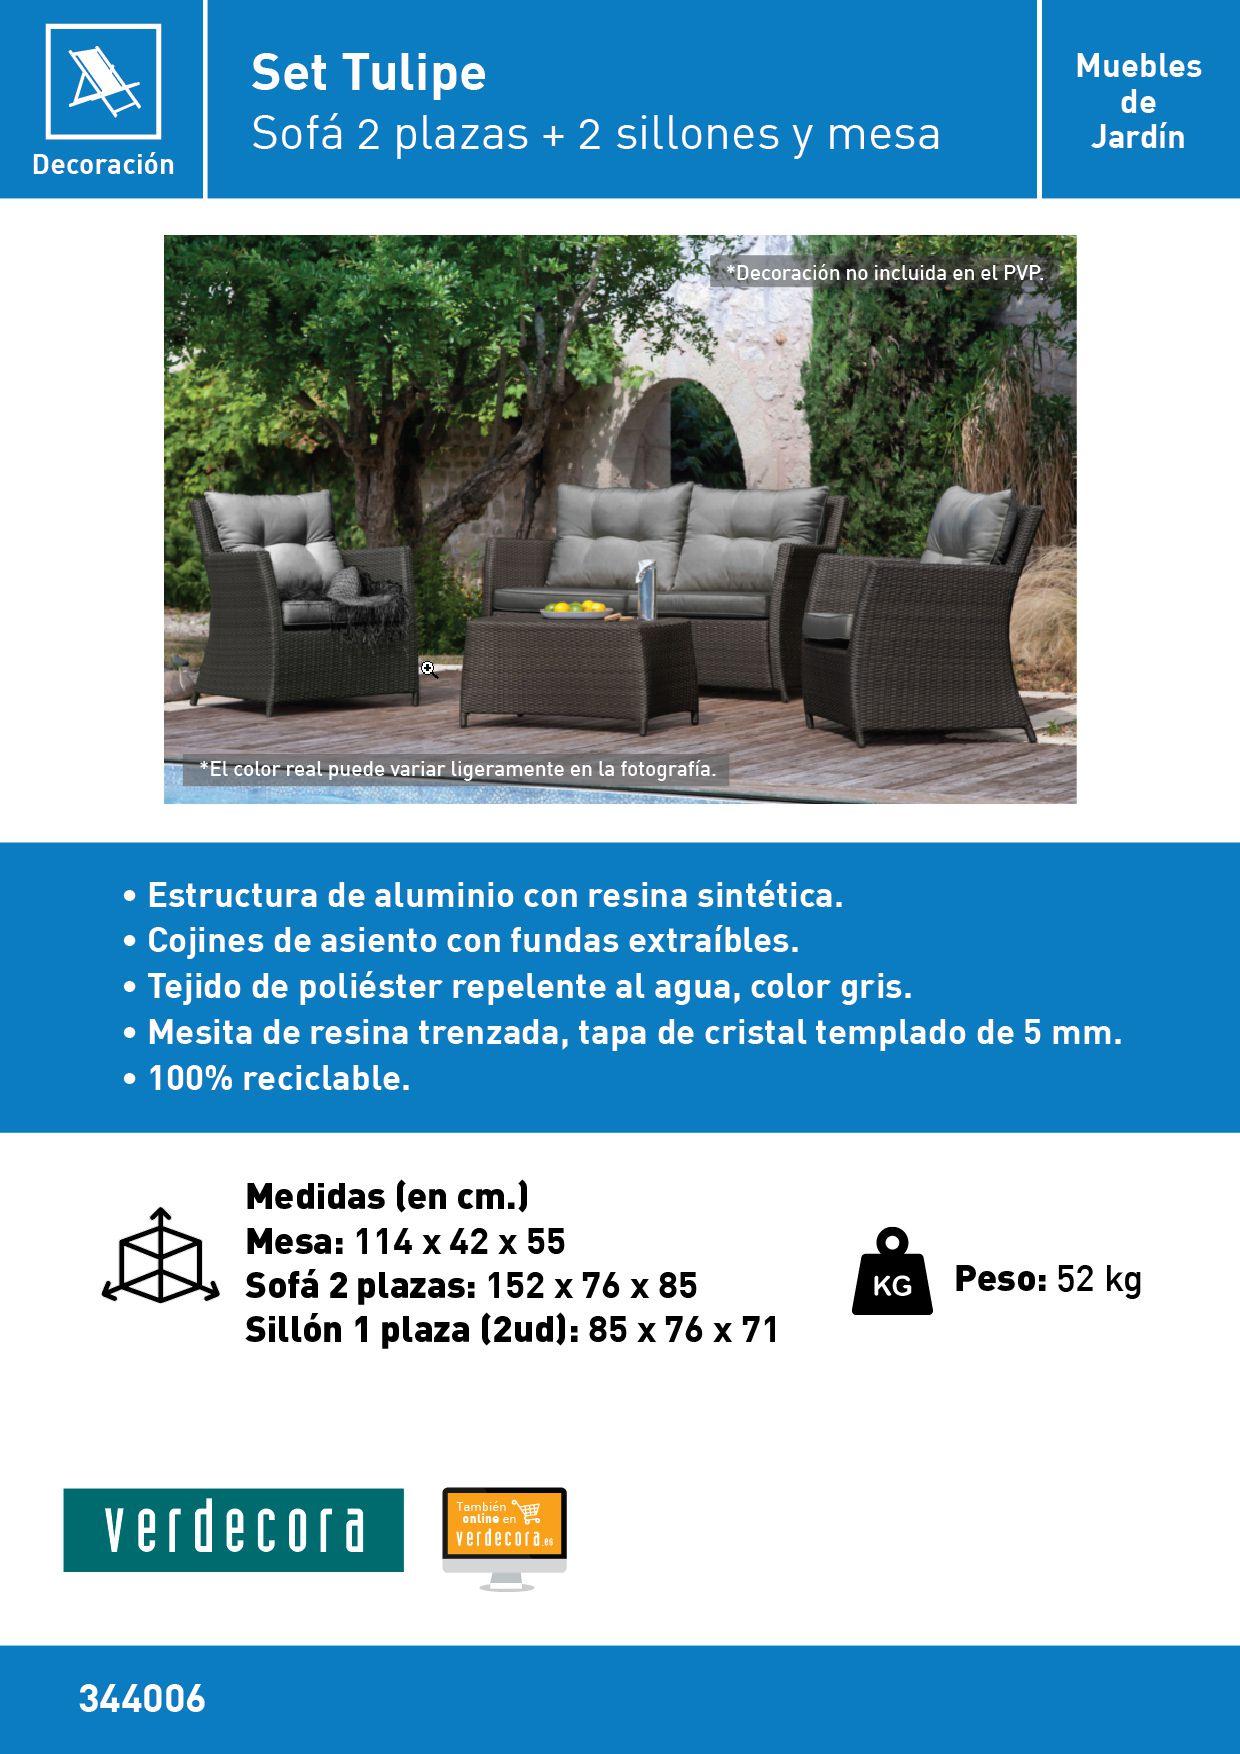 Conjunto De Muebles Jardin Tulipe Verdecora # Muebles Riego De La Vega